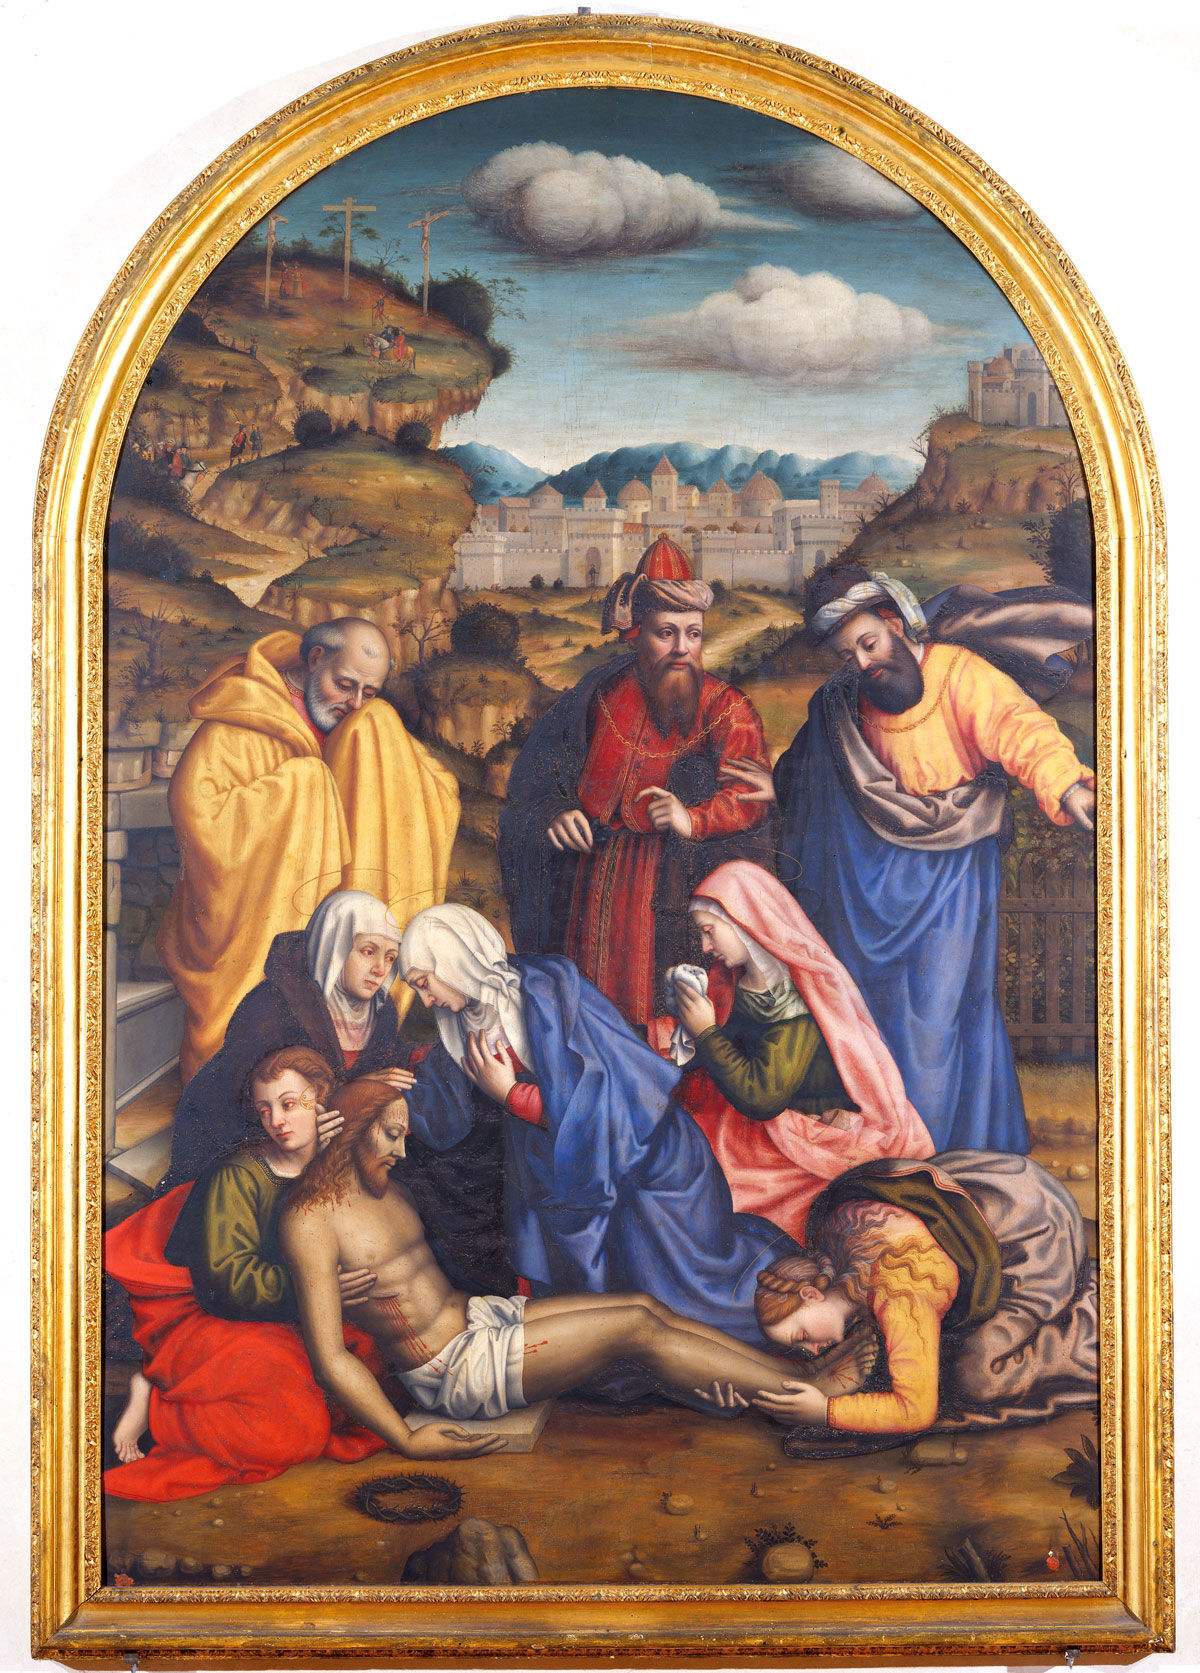 Suor Plautilla Nelli, Lamentation with Saints.  Courtesy of the Advancing Women Artists Foundation.